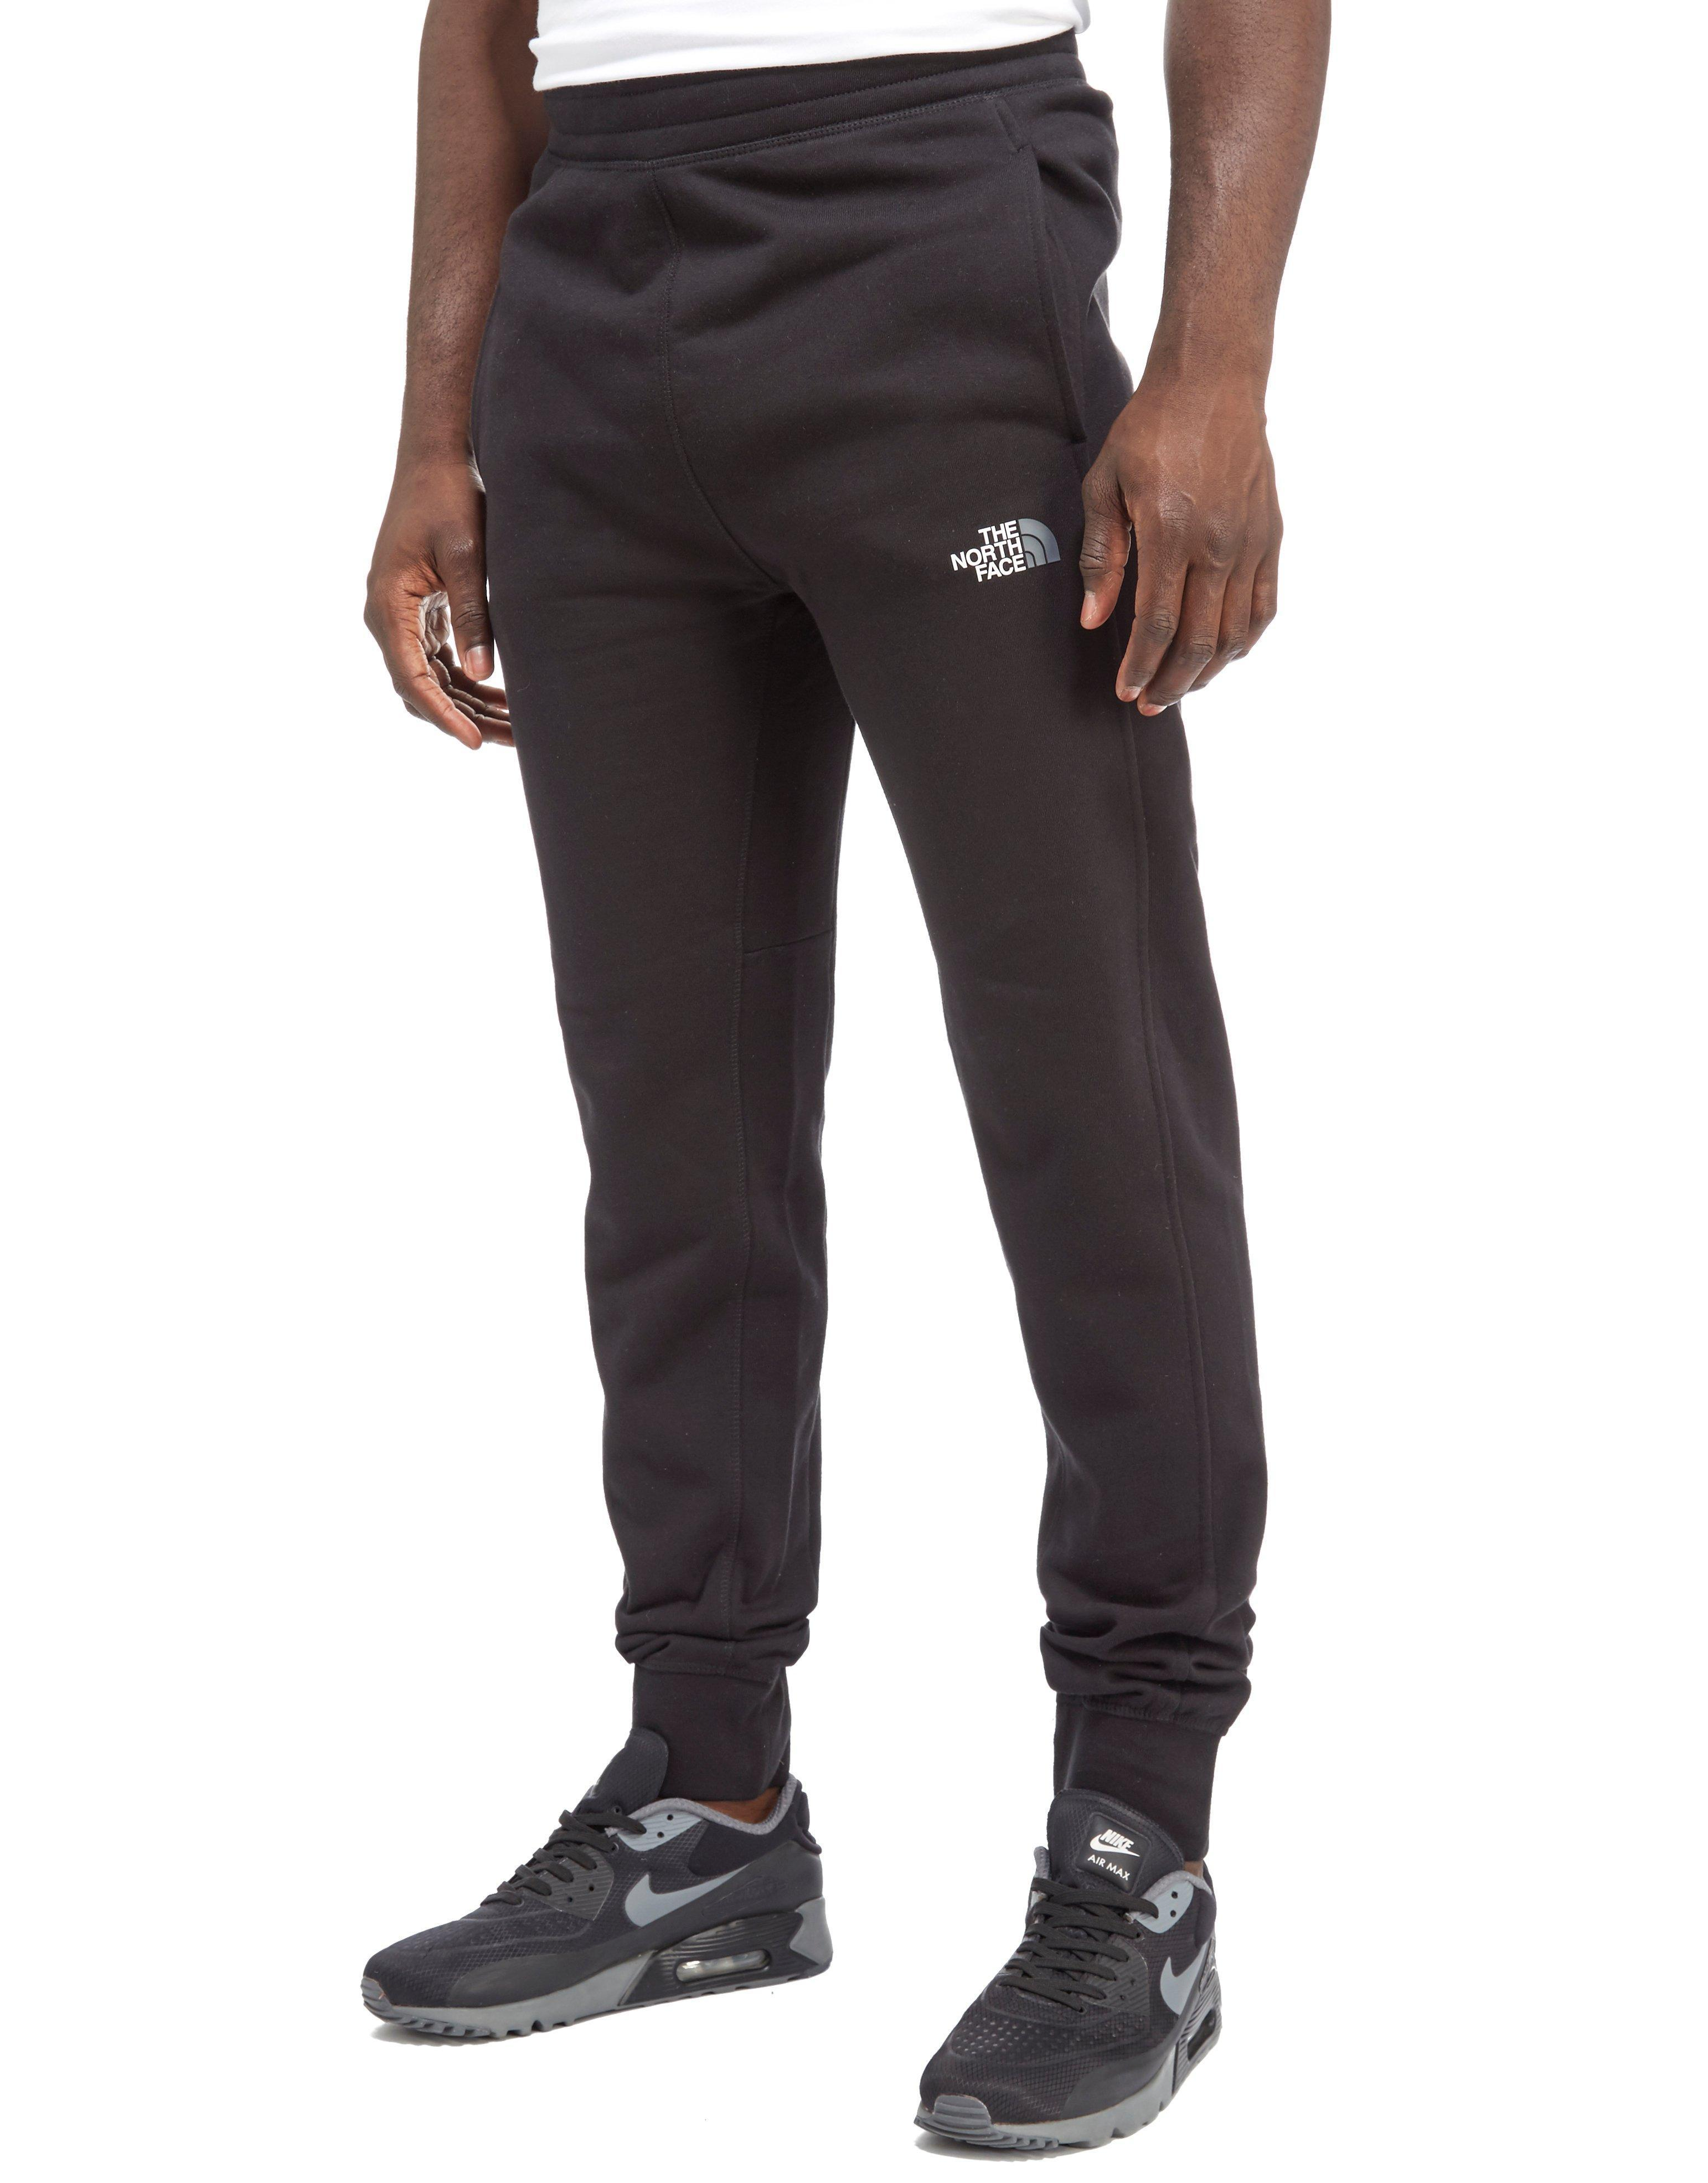 f943f294a The North Face Black Bondi 17 Fleece Tracksuit Pants for men